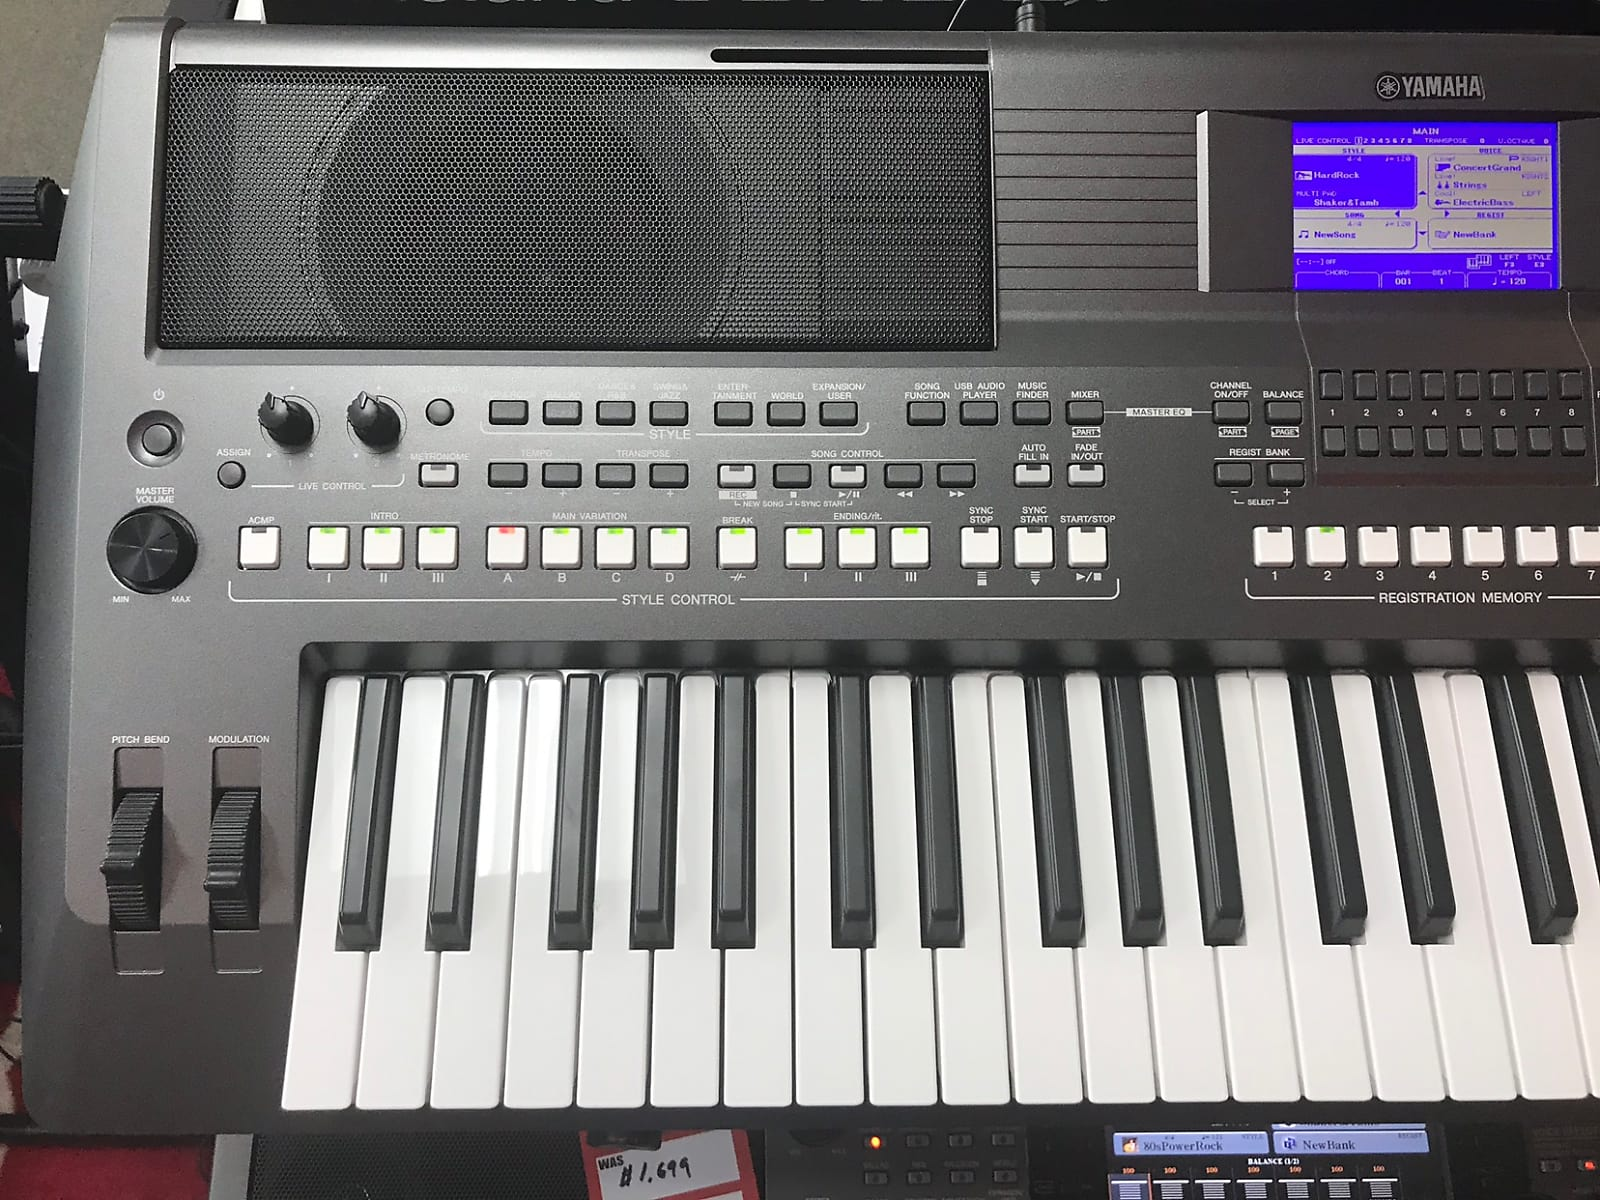 Yamaha PSR-S670 61-Key Arranger Workstation 2017